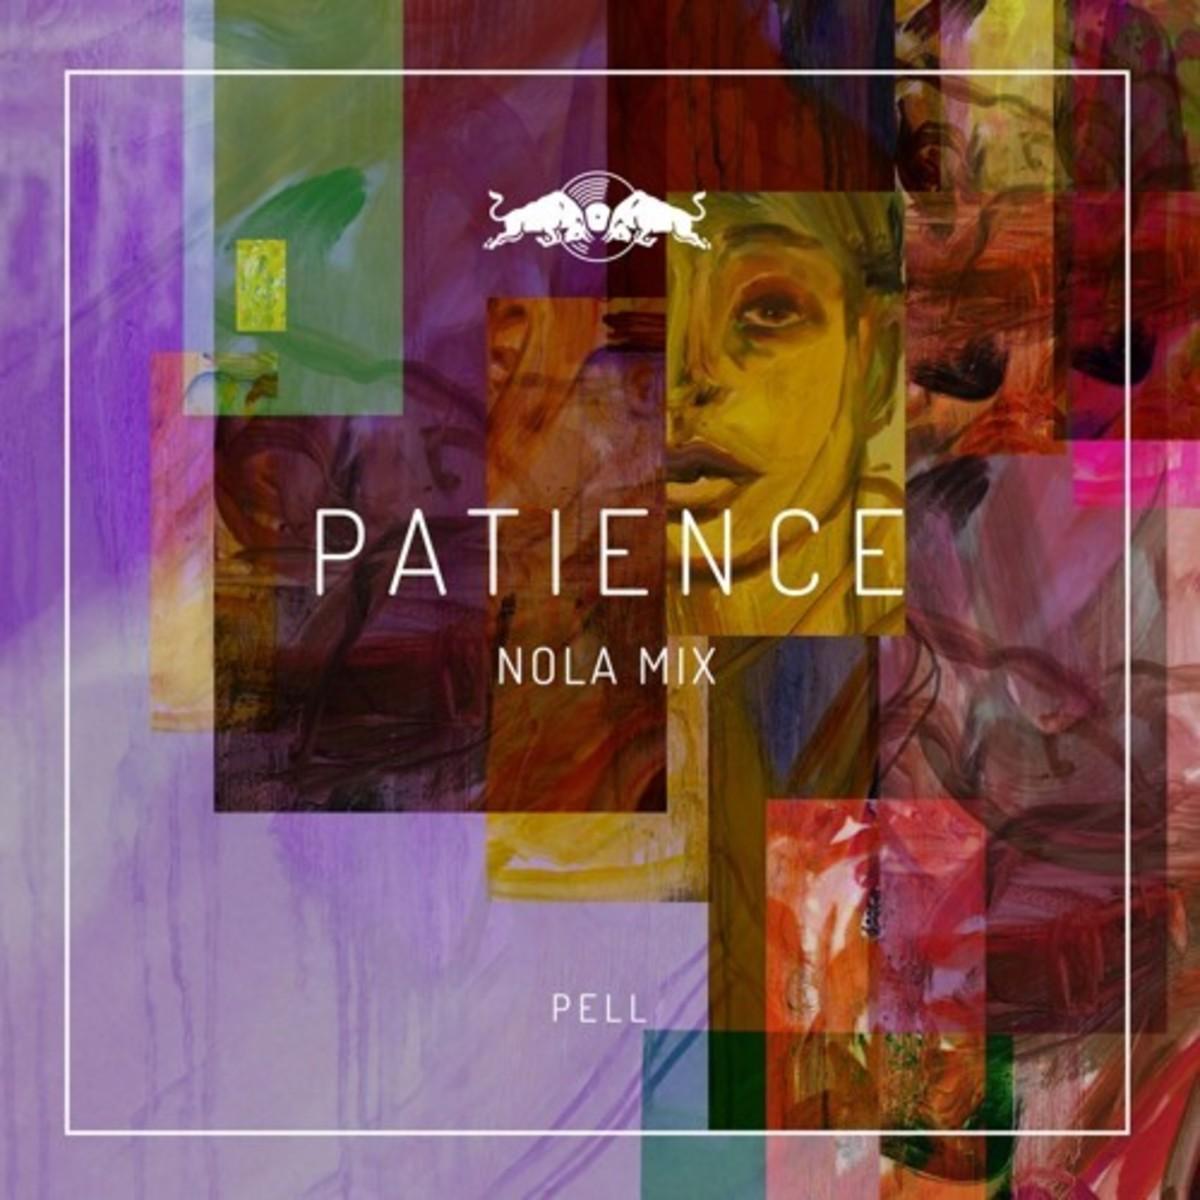 pell-patience-nola-rmx.jpg